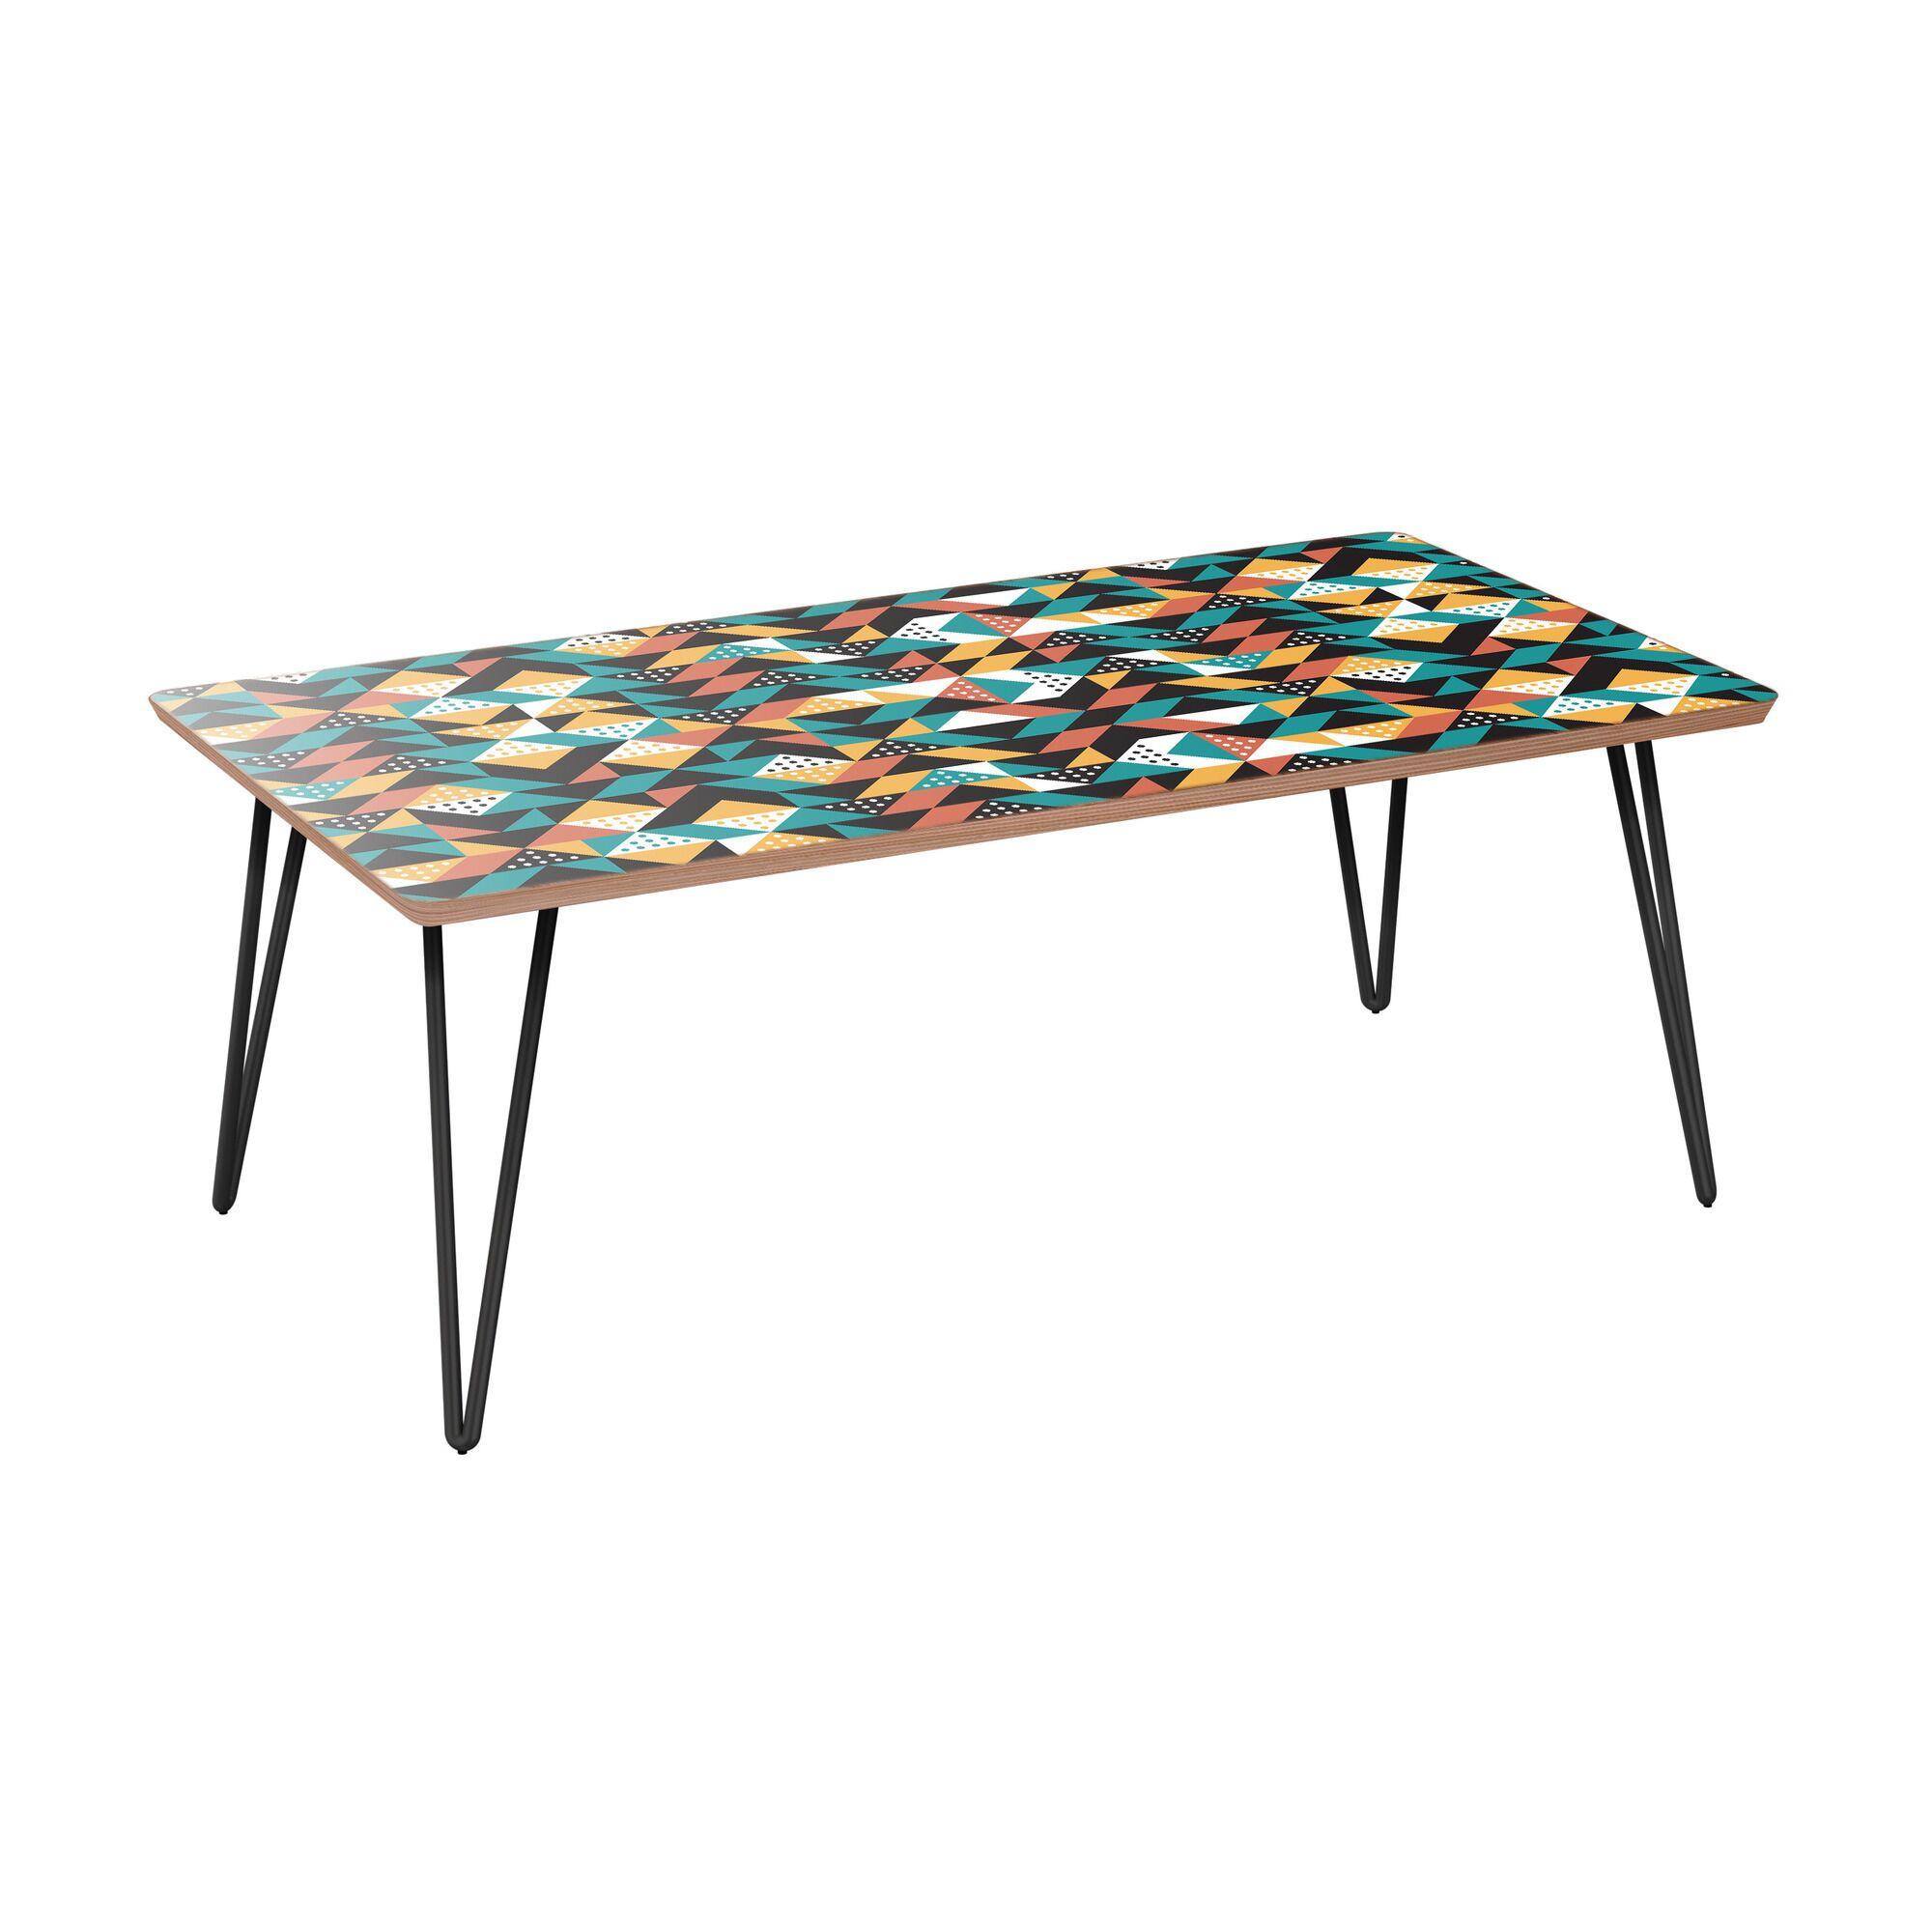 Arceneaux Coffee Table Table Base Color: Black, Table Top Color: Walnut